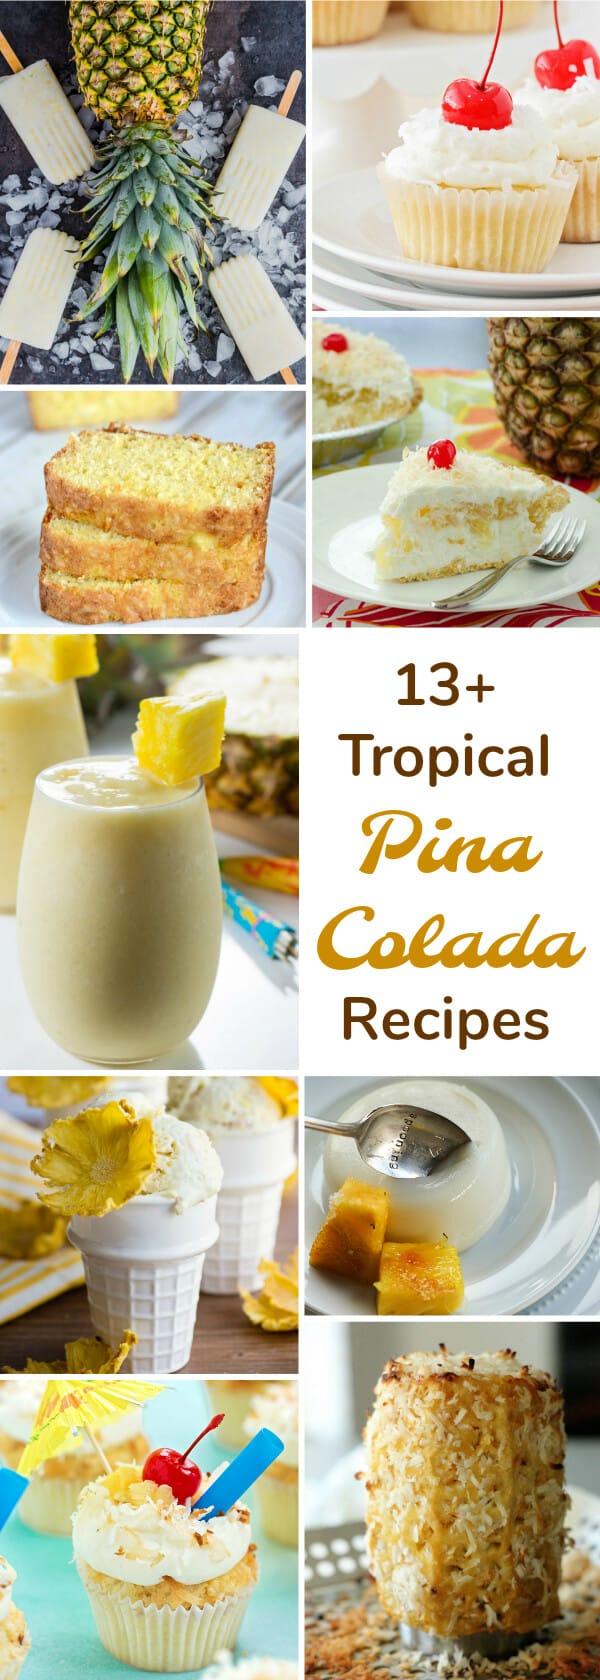 thirteen pina colada recipes